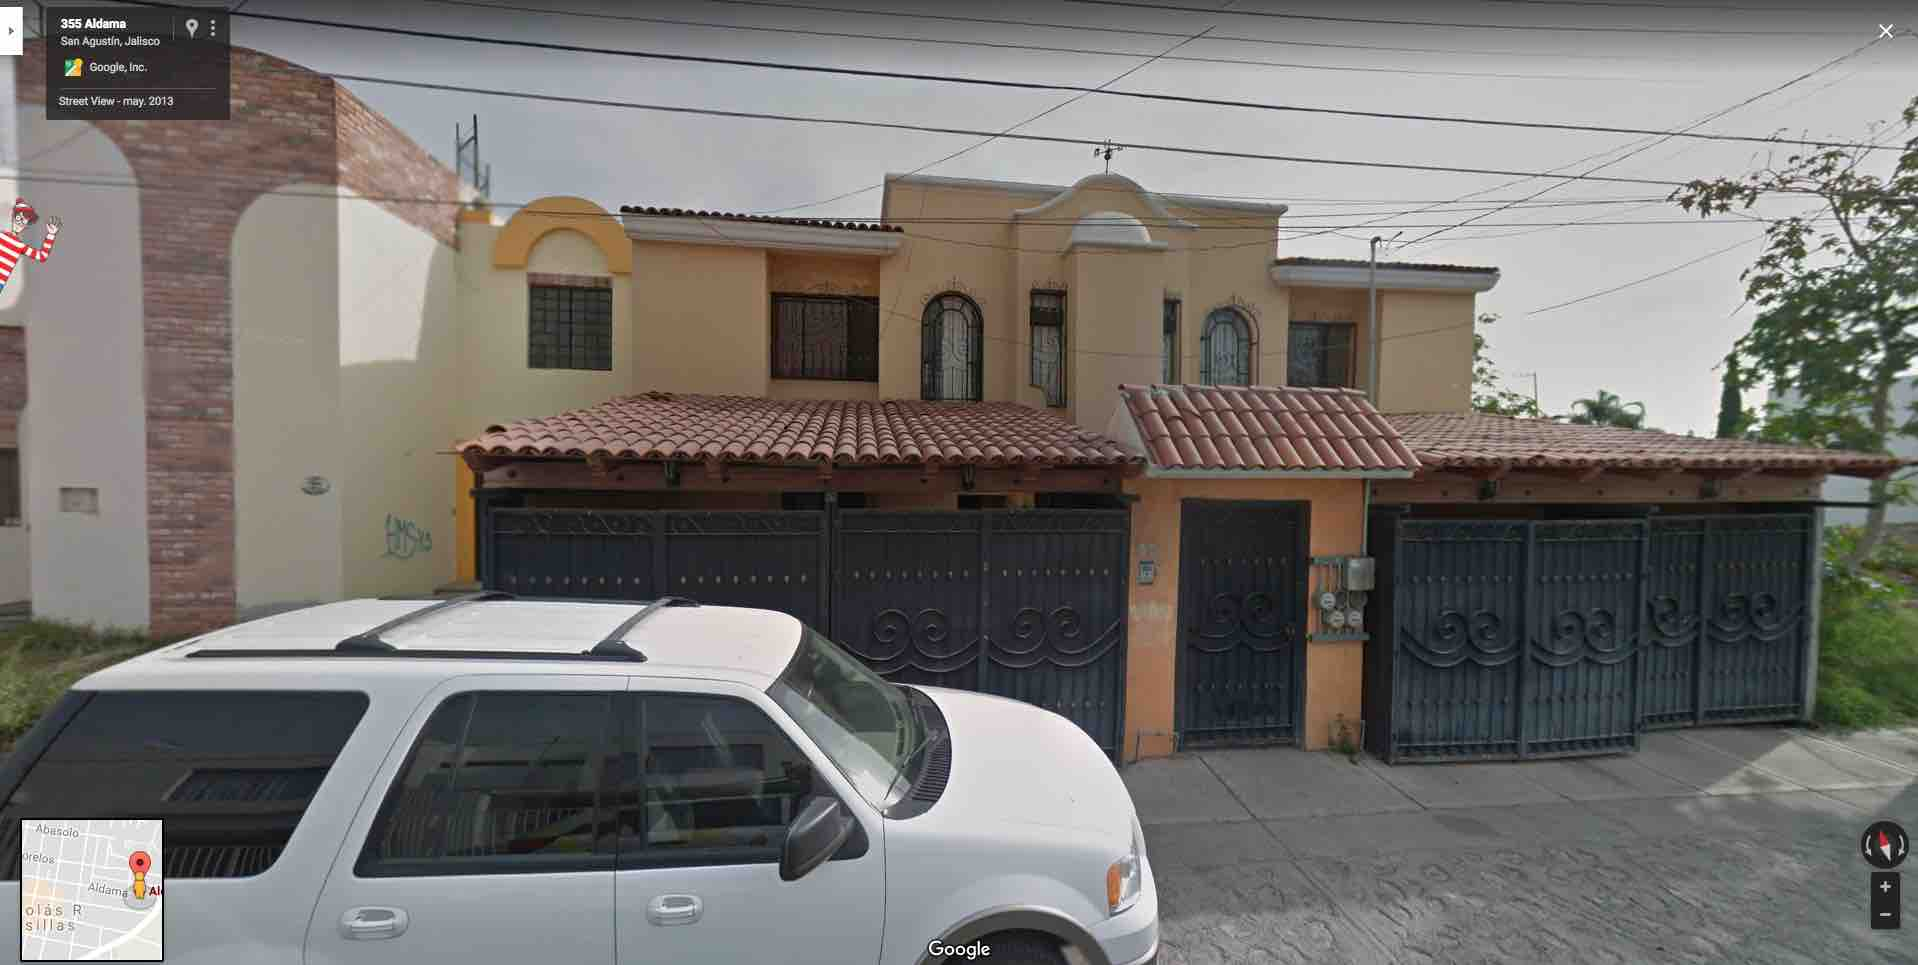 Fracc. San Agustin, Calle Aldama Casas 247, 247-A, 248 y 248-A, Tlajomulco, Jal.